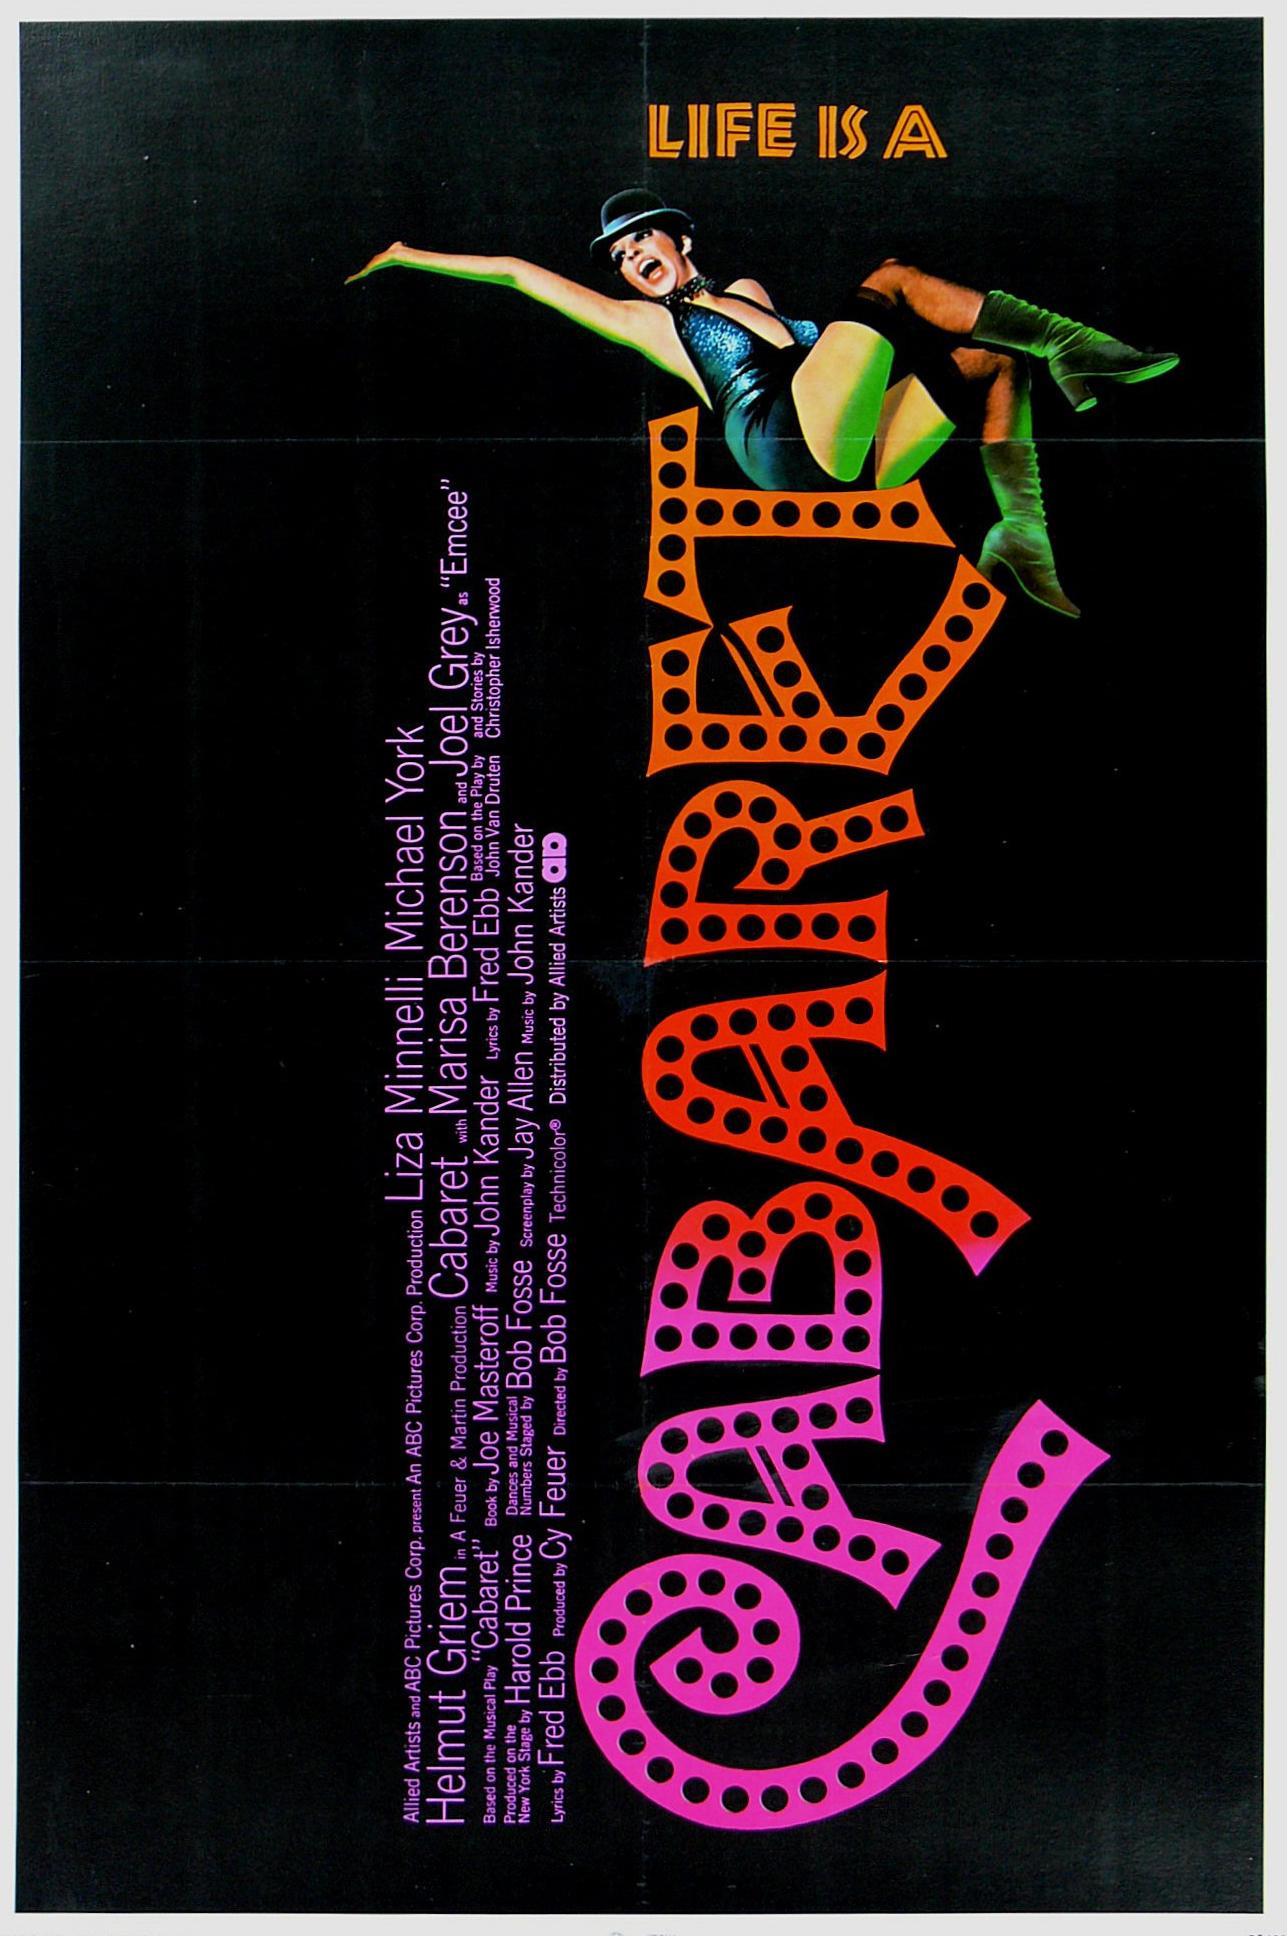 Cabaret film poster